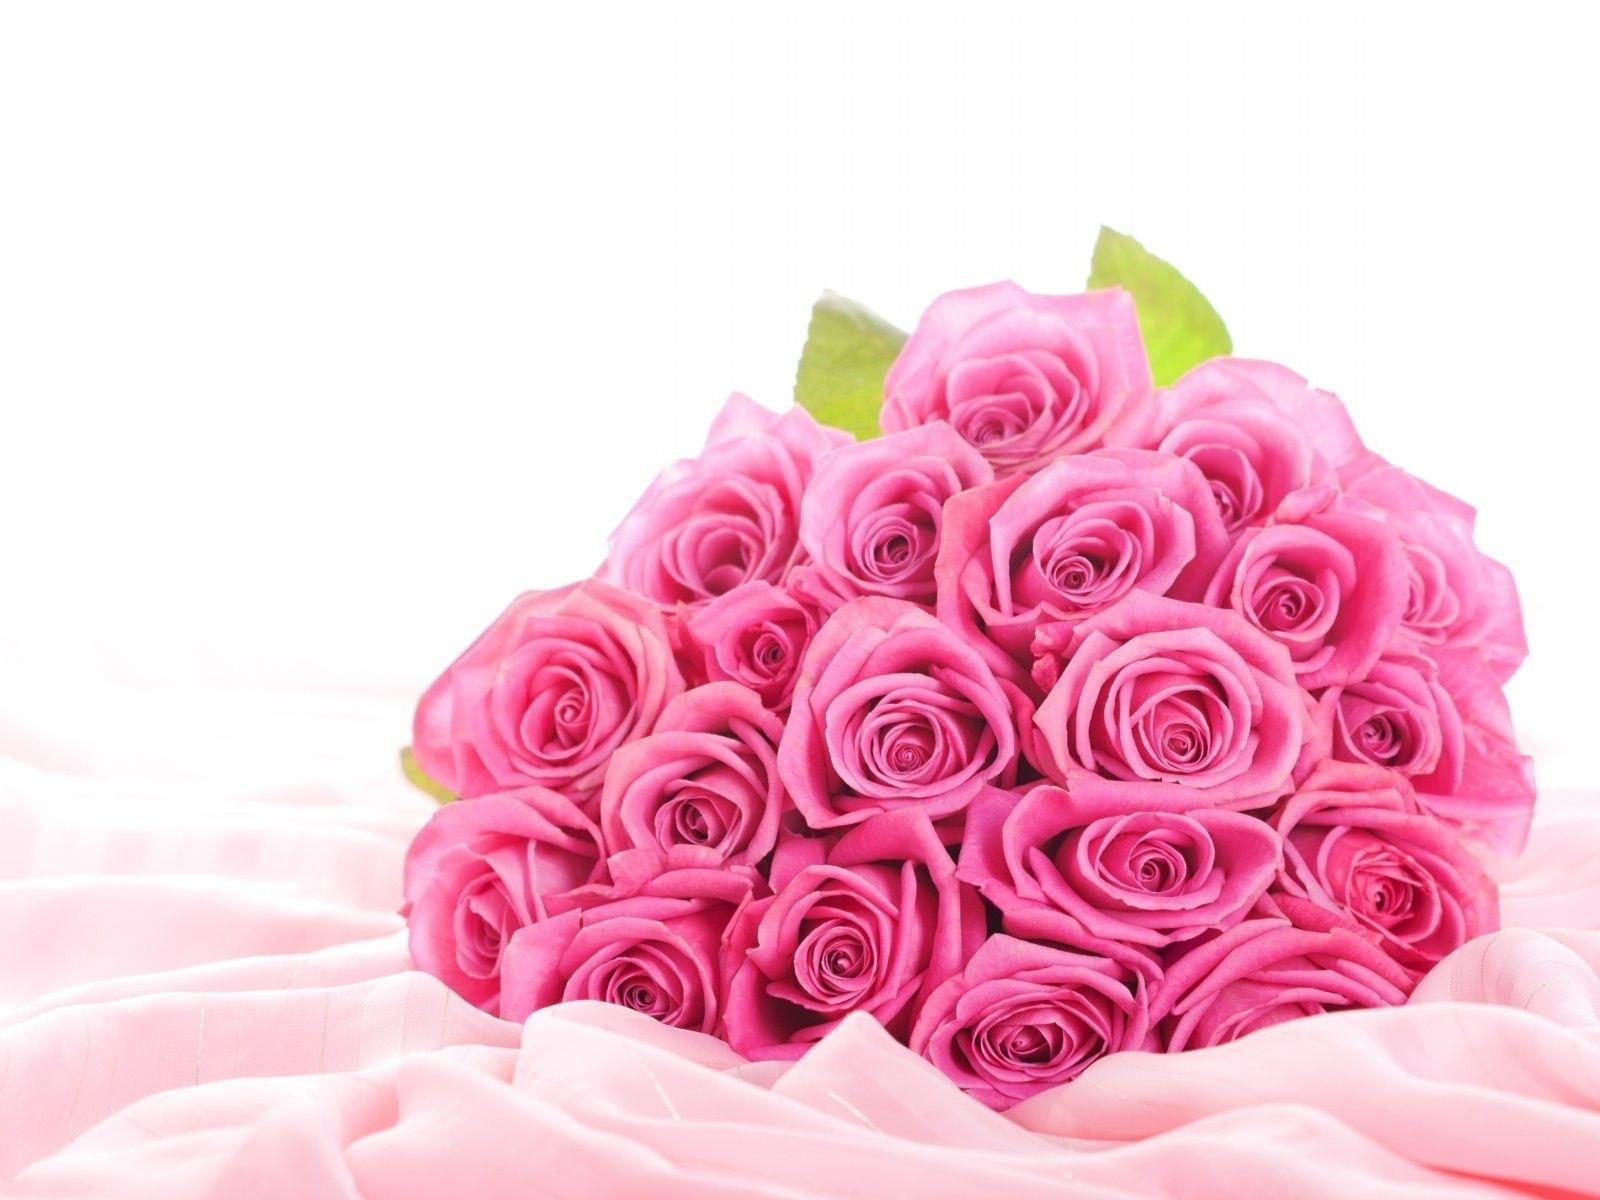 Desktop Of Pink Roses Hd Flower Wallpaper Cool Rose - Beautiful Pink Rose Flower , HD Wallpaper & Backgrounds